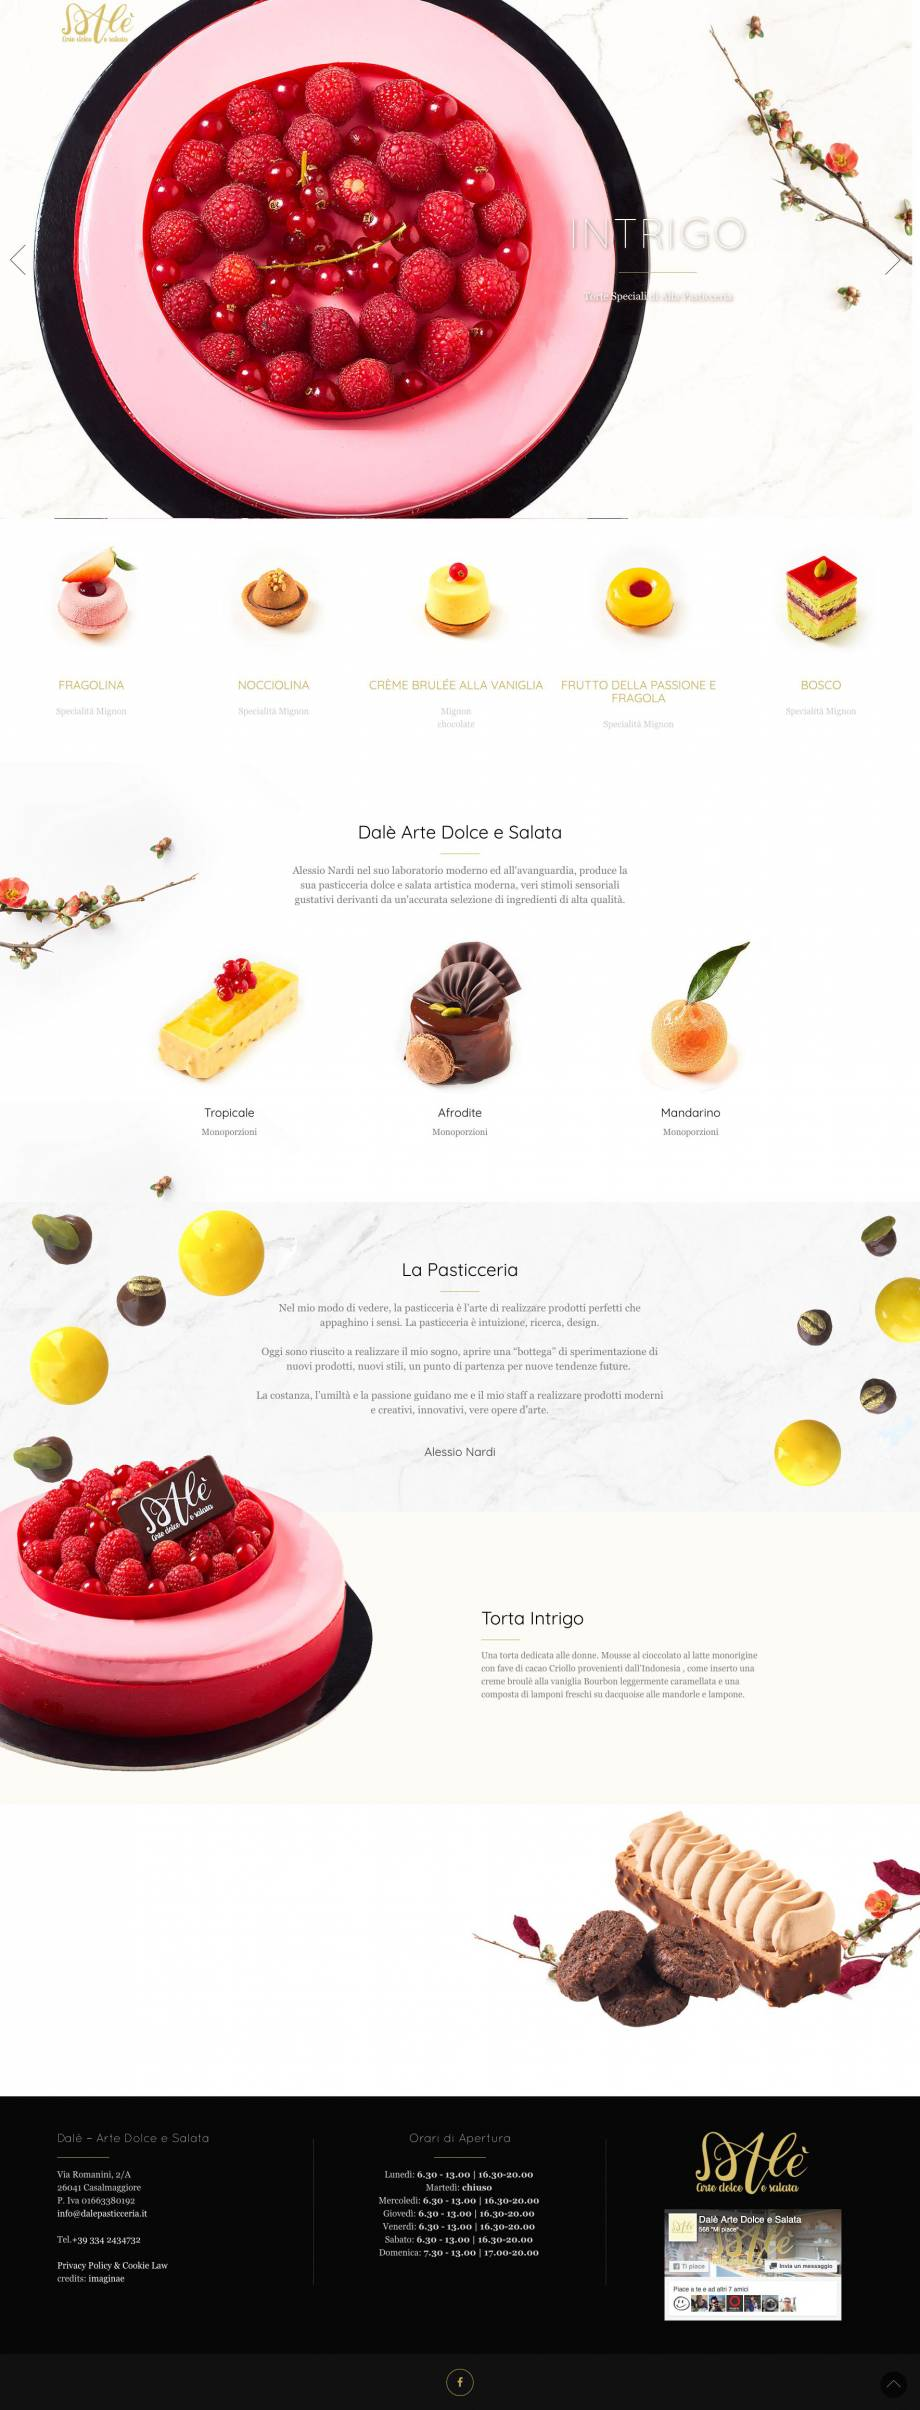 Web Design, Fotografia, Web Site, Social Media Strategy, Grafica, Responsive Smartphone & Tablet, Immagine Coordinata, Art Direction & Visual Design,